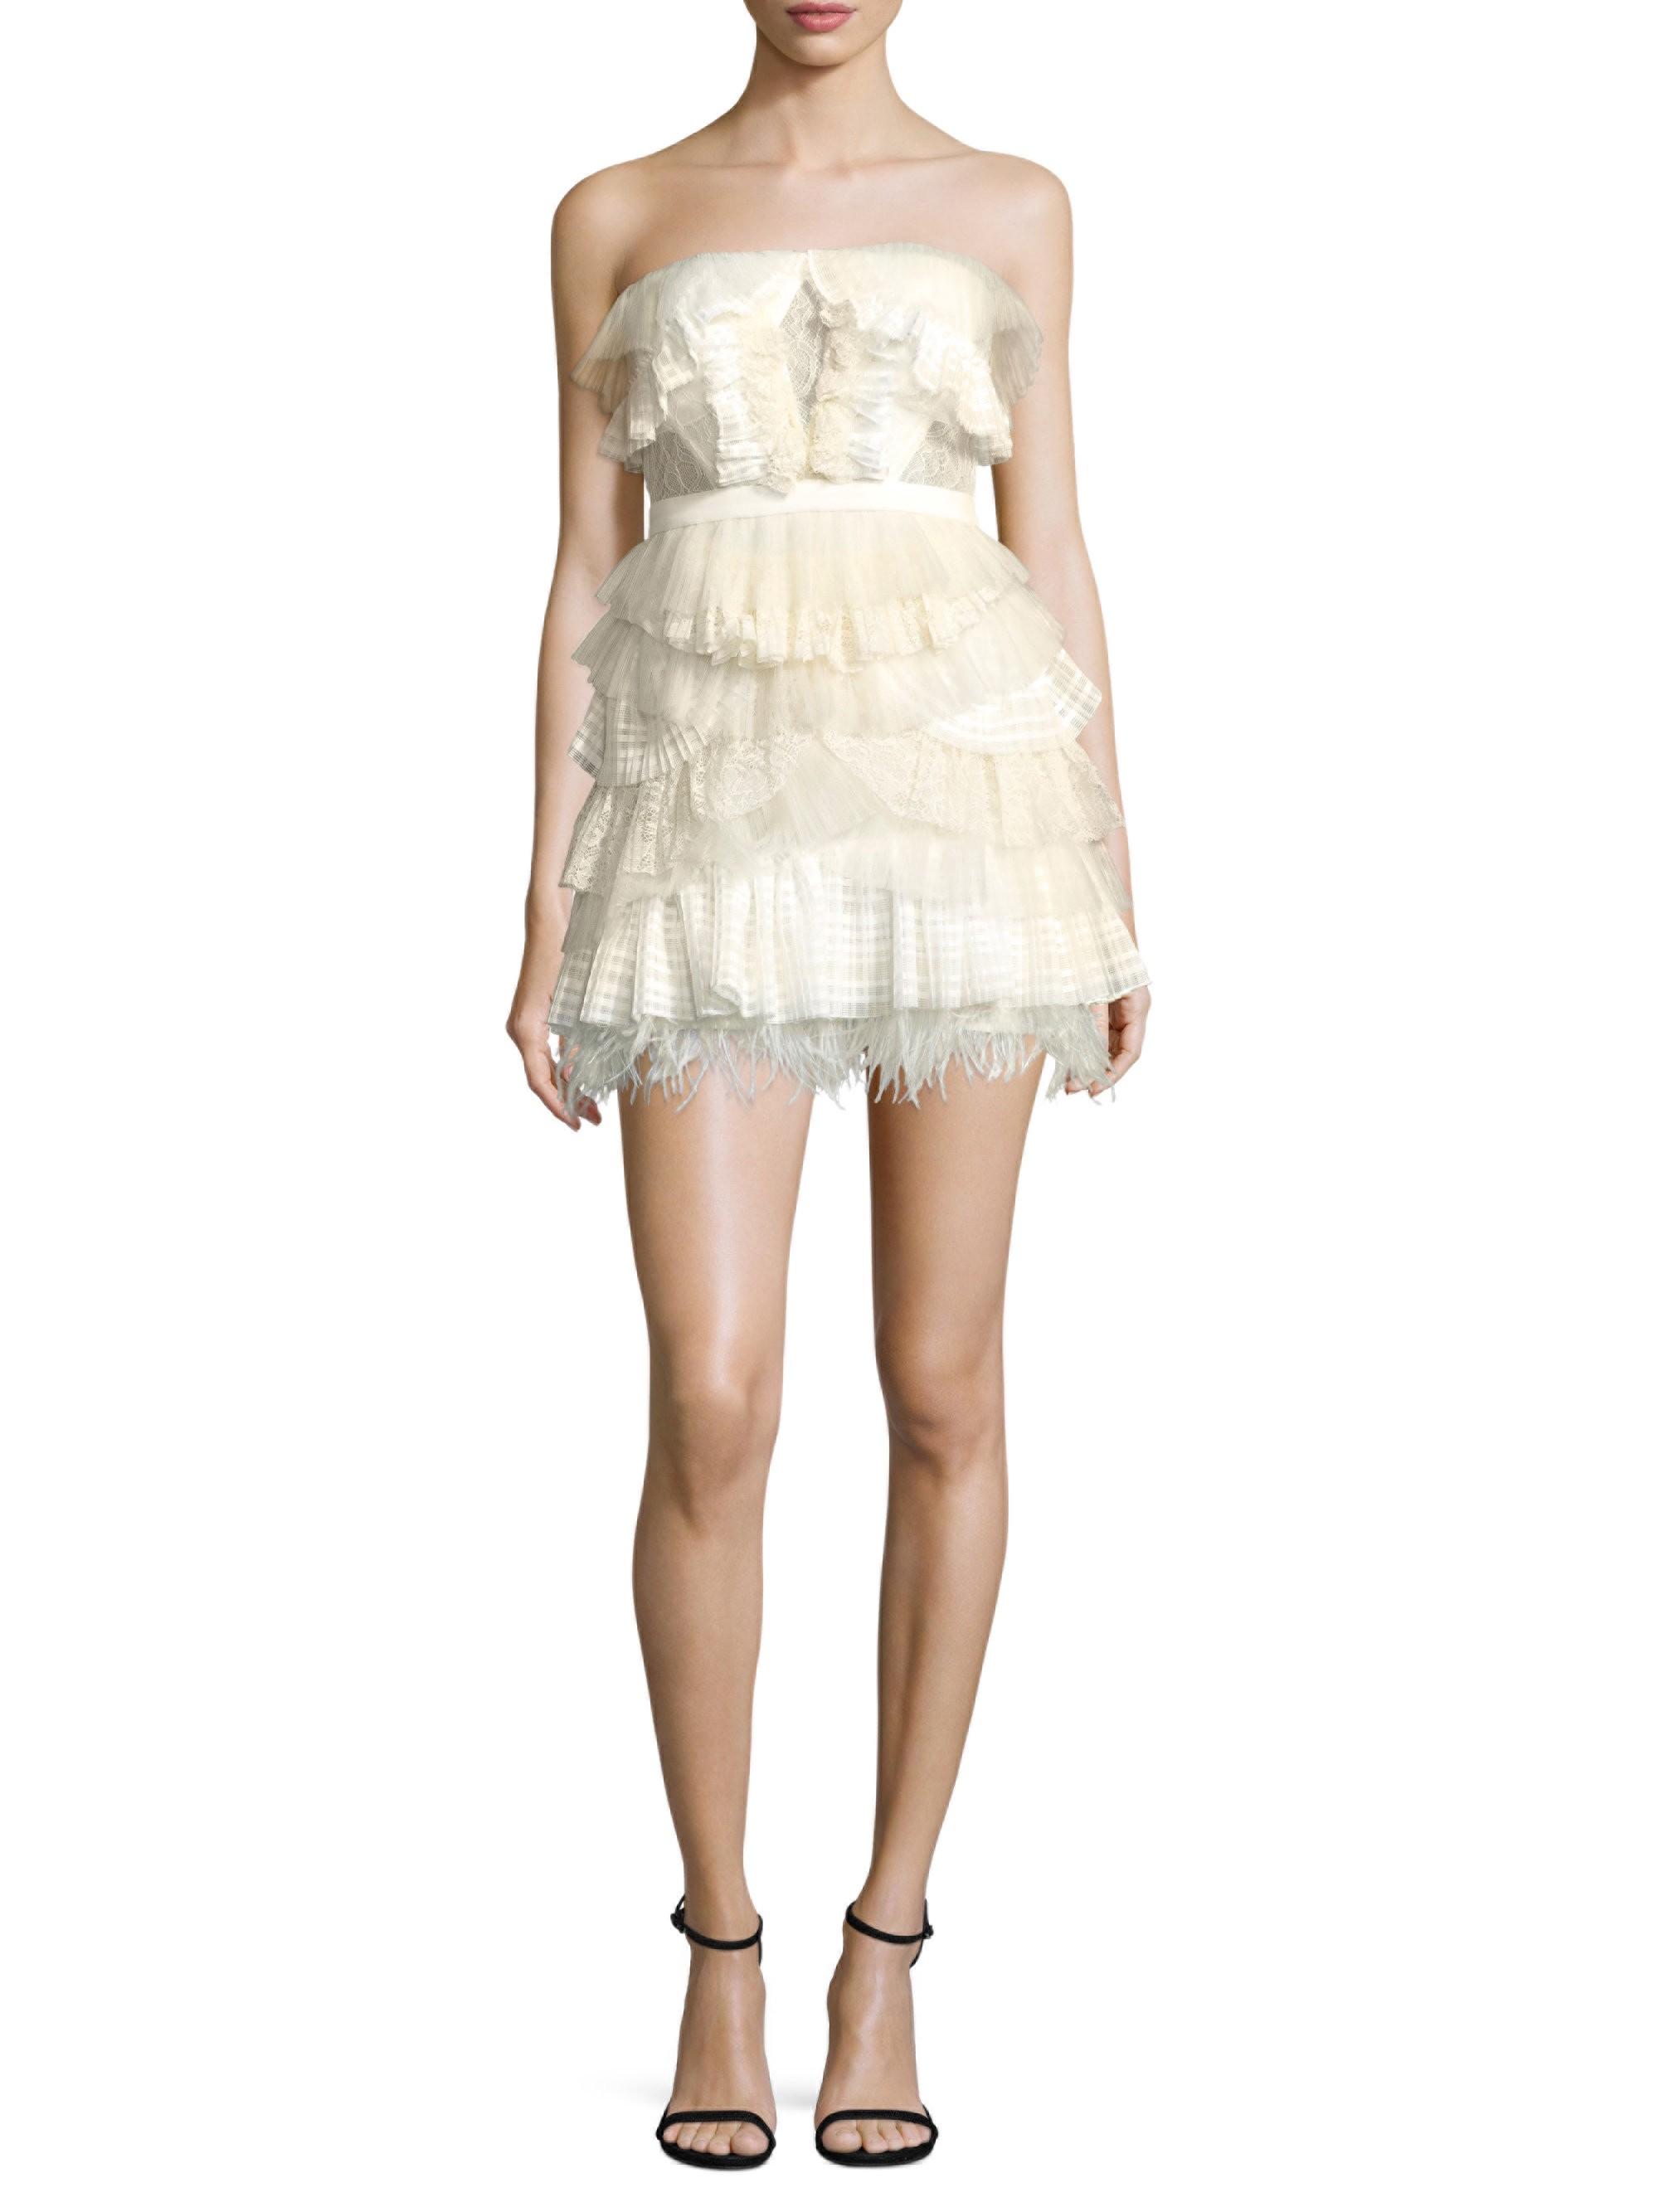 Bcbgmaxazria Tiered Ruffle Dress Off White Combo 12 Tiered Ruffle Dress Tiered Ruffle Mini Dress Strapless Ruffle Dress [ 2667 x 2000 Pixel ]